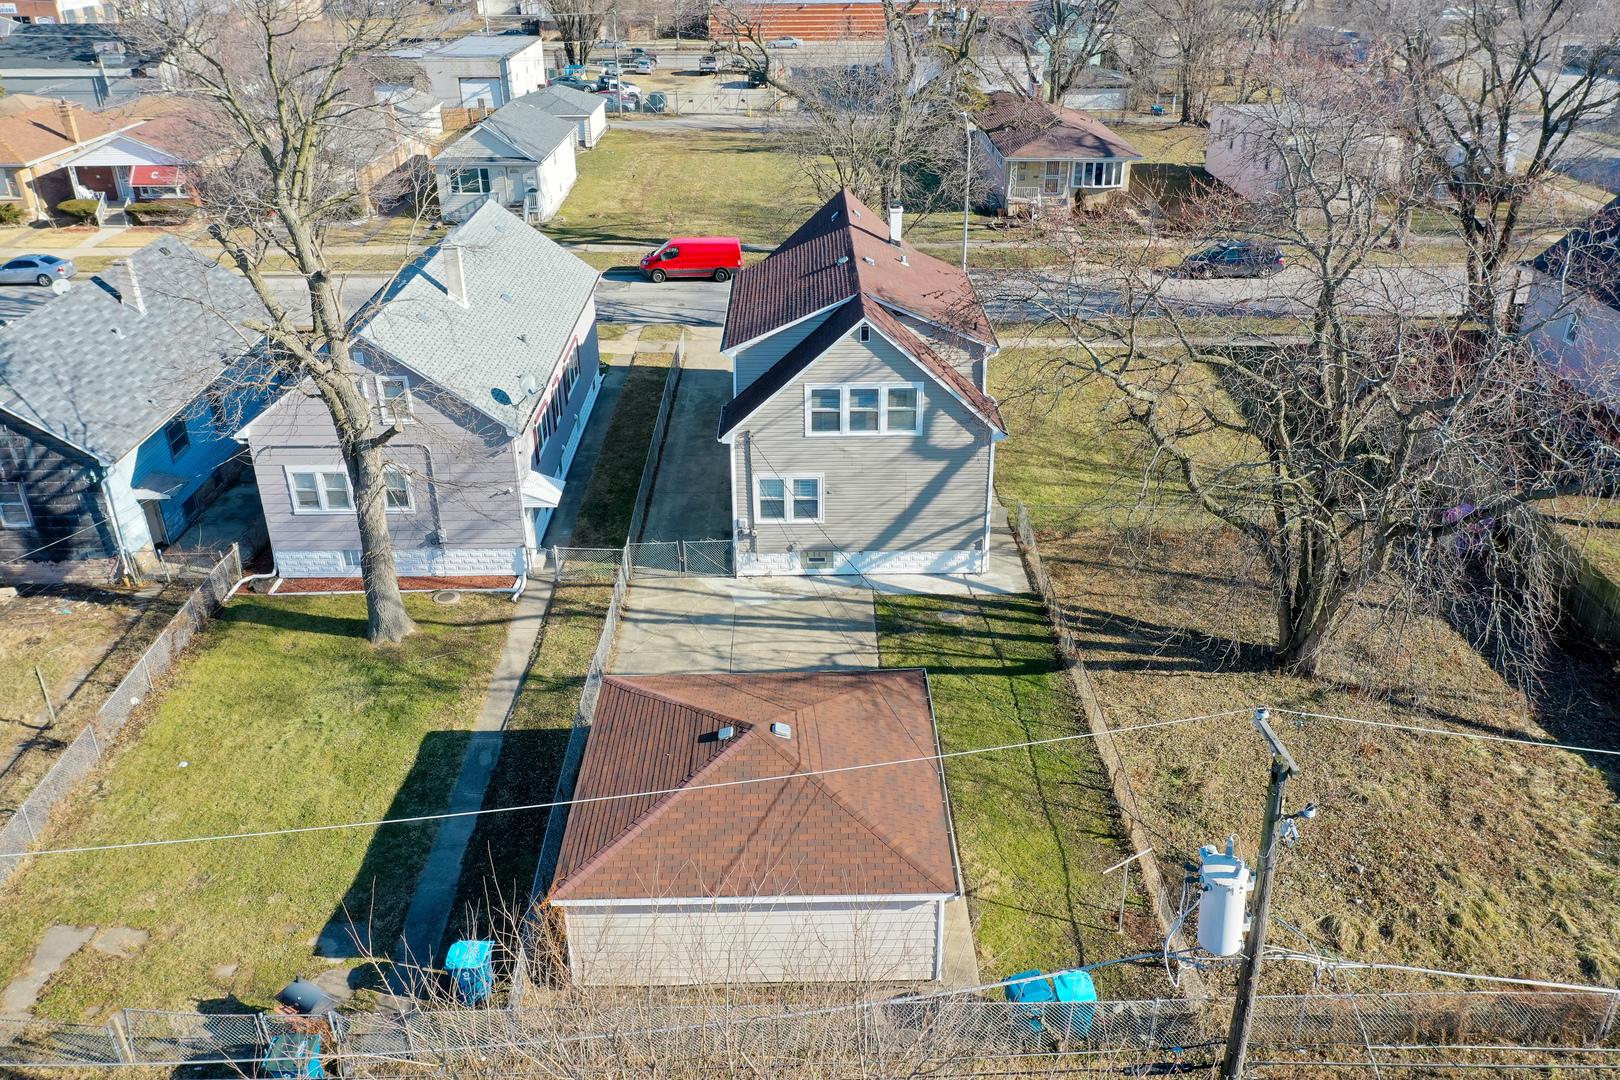 12342 South Green, Calumet Park, Illinois, 60827